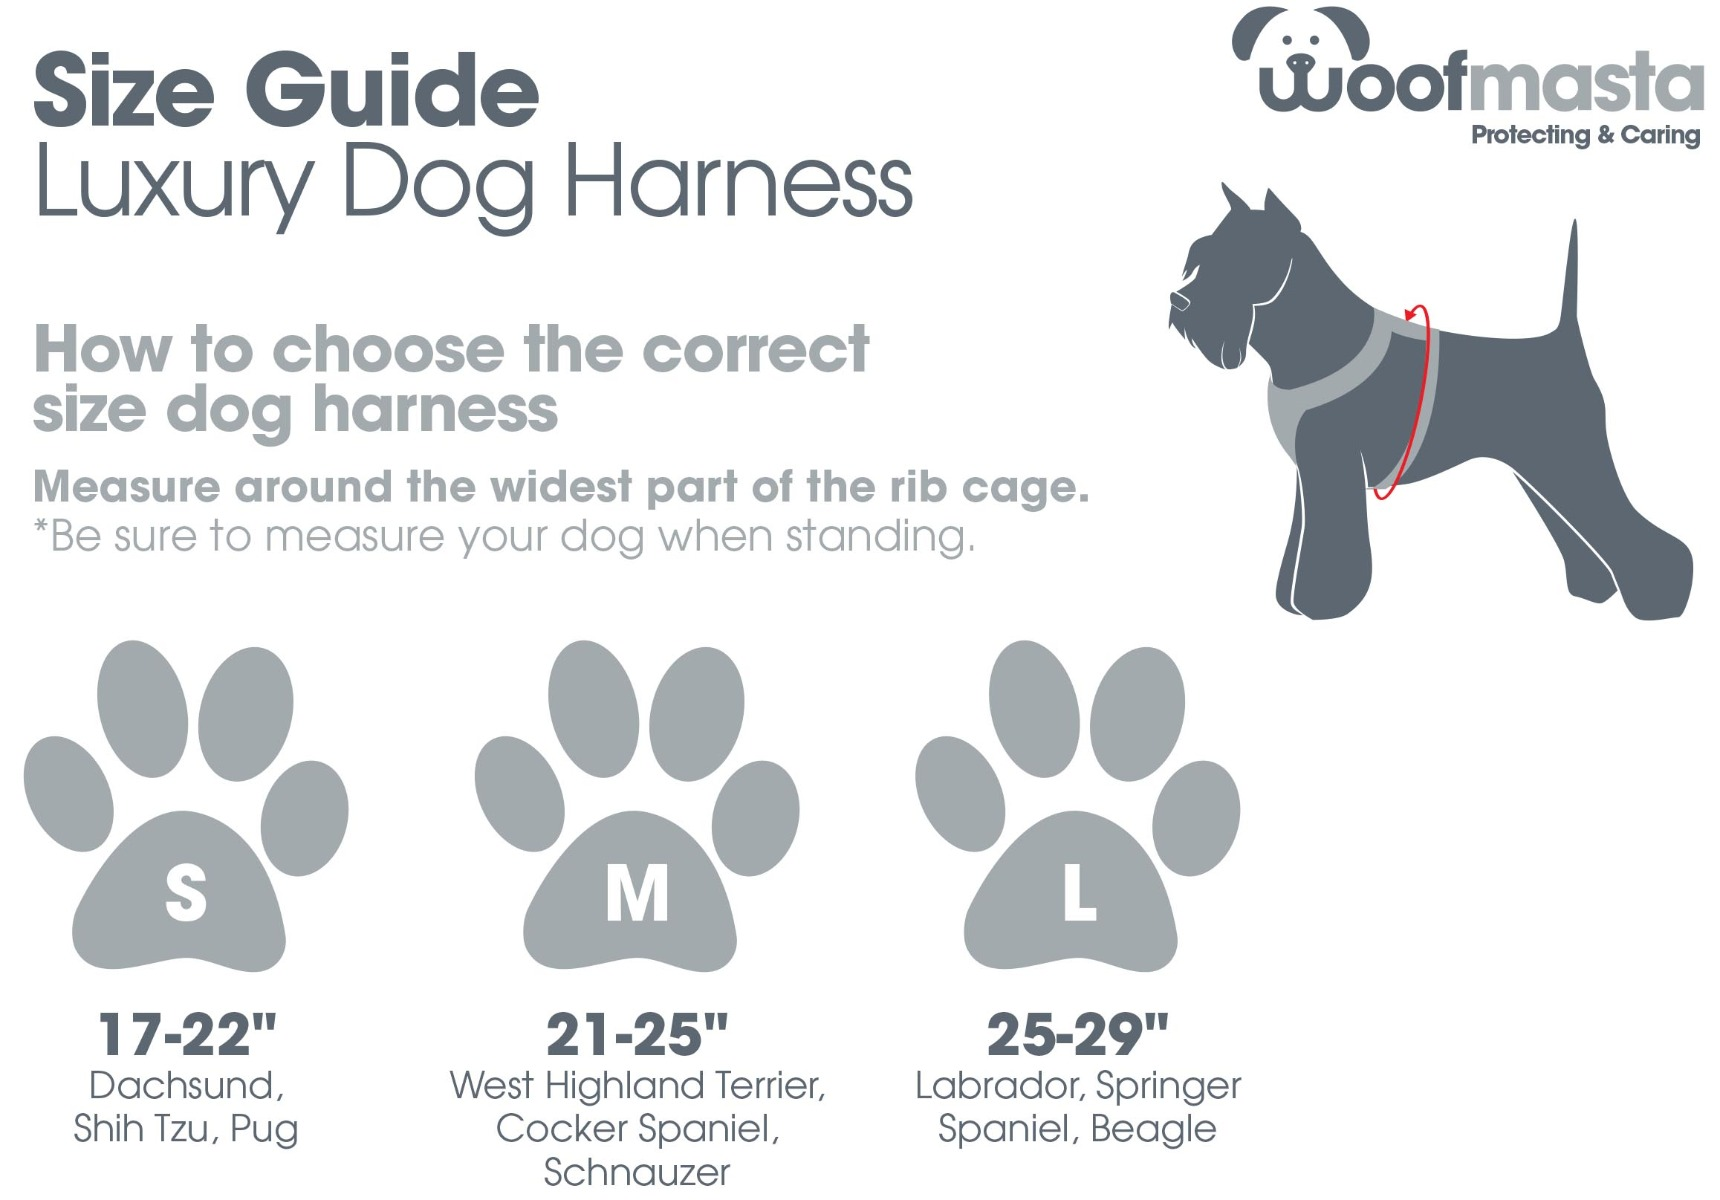 Woofmasta Dog Harness | Size Guide